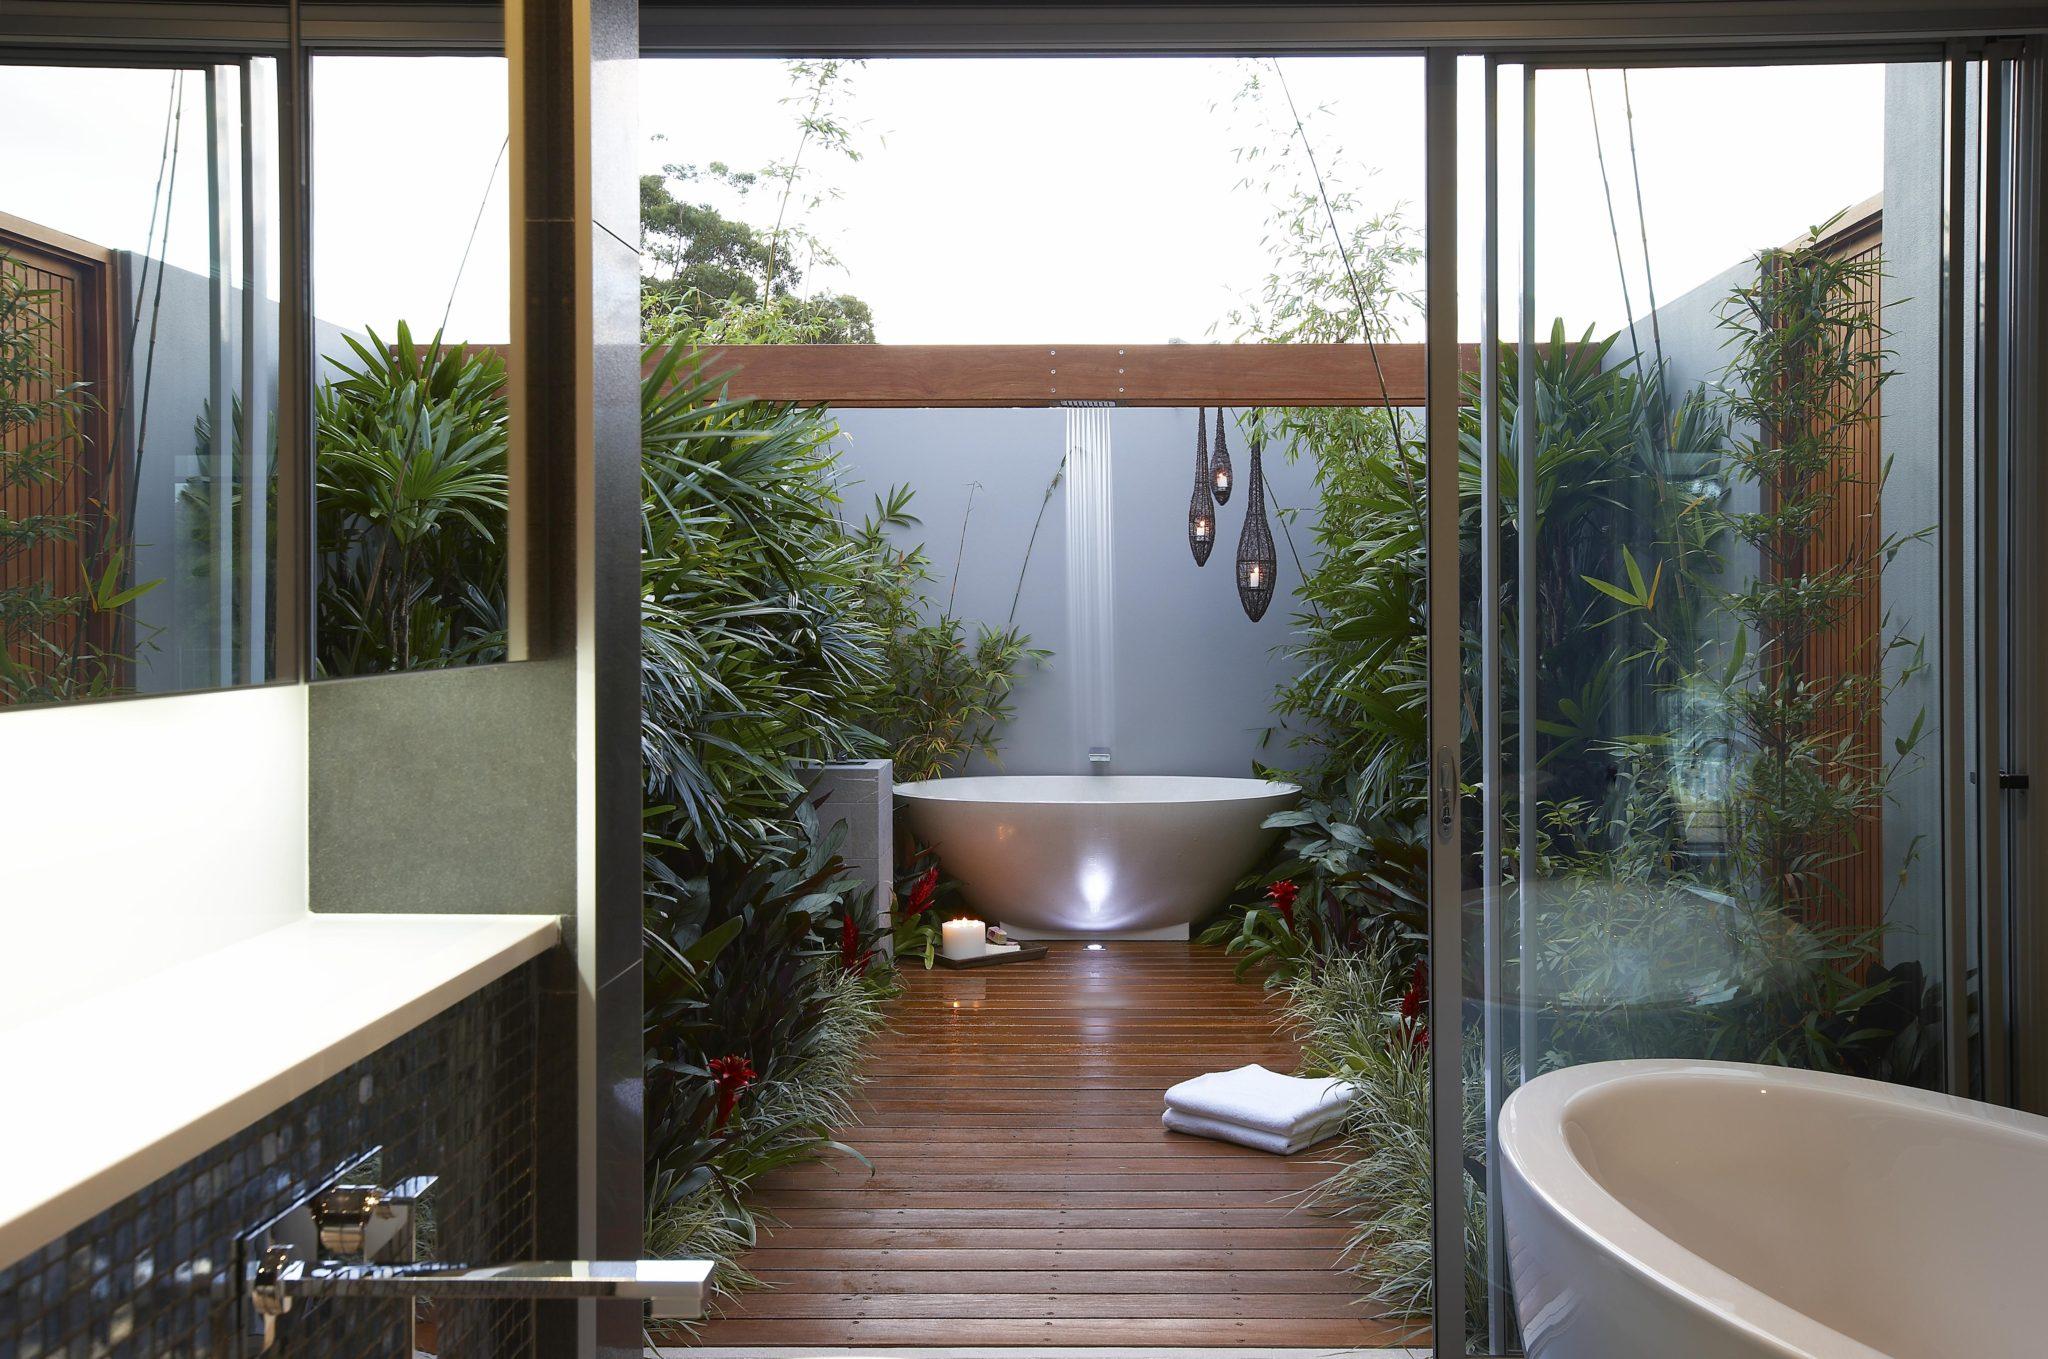 Bathroom Design Ideas Reece reece bathroom accessories - ierie